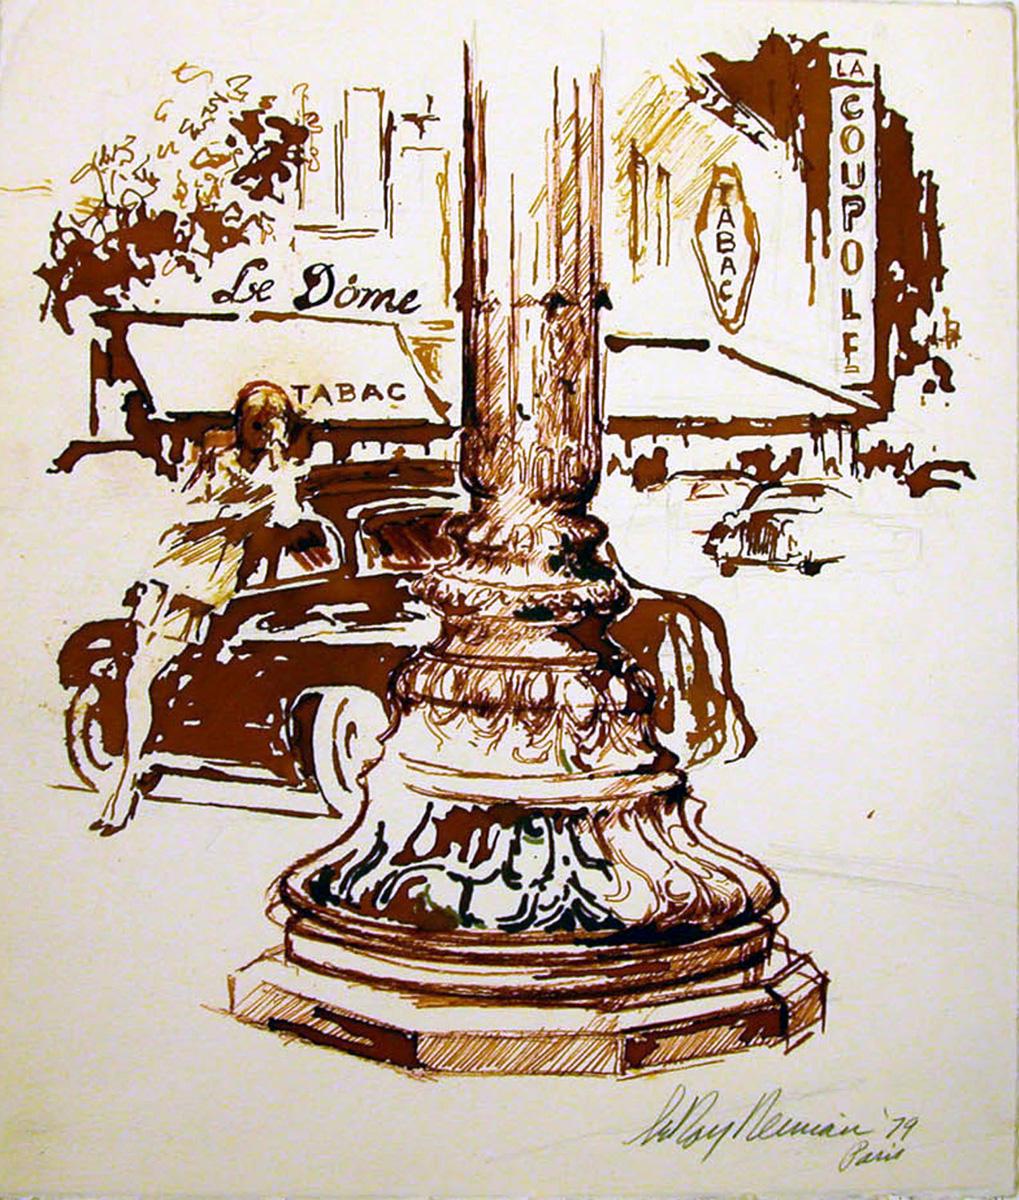 SOLD Paris Corner, mixed media on paper, 13 5/8 x 11 1/2 in., 1979